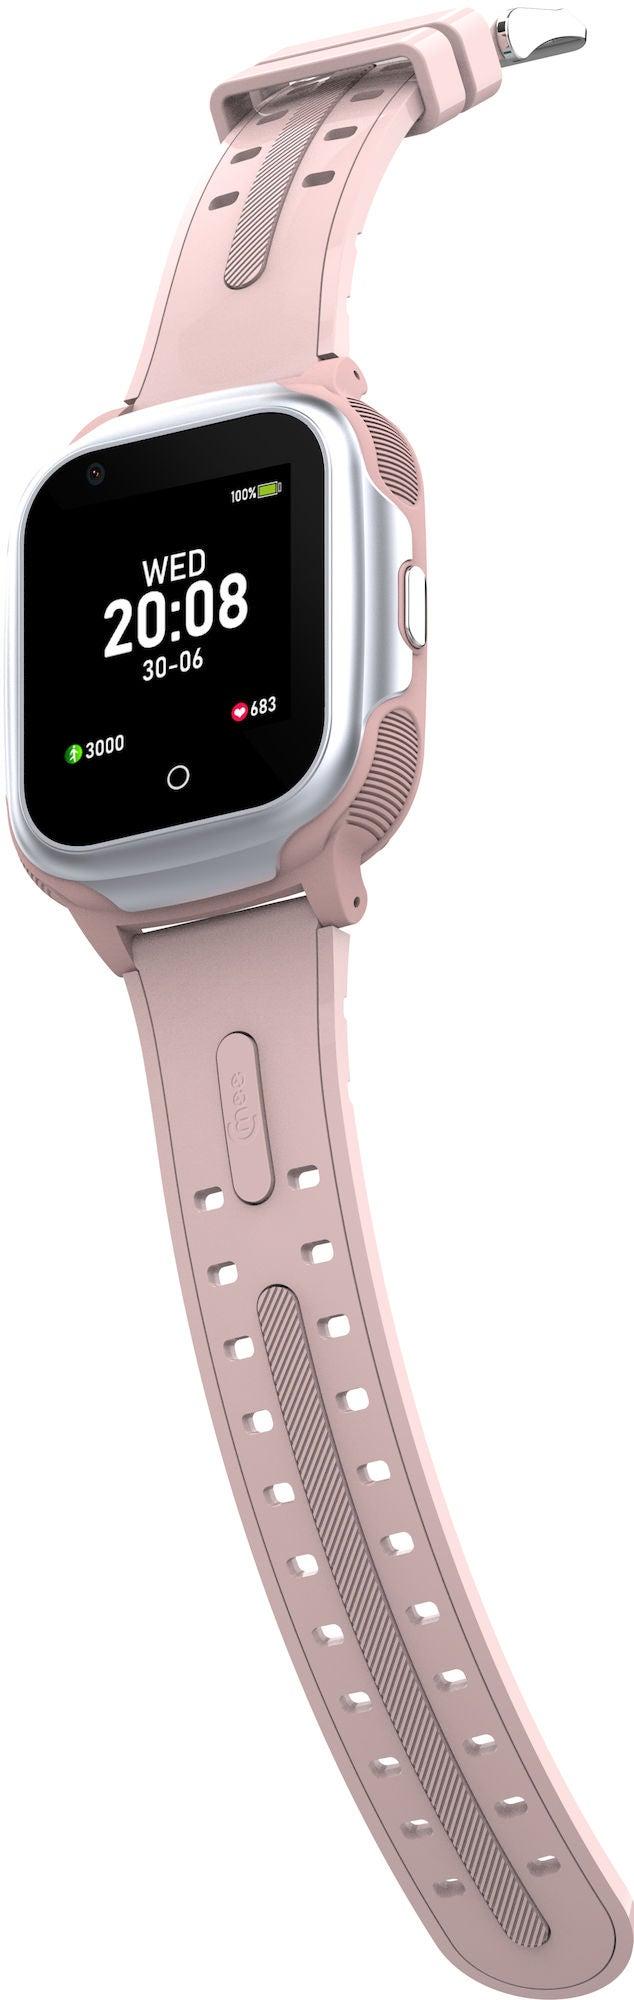 Cmee Play Skal till GPS-klocka, Fashion Pink